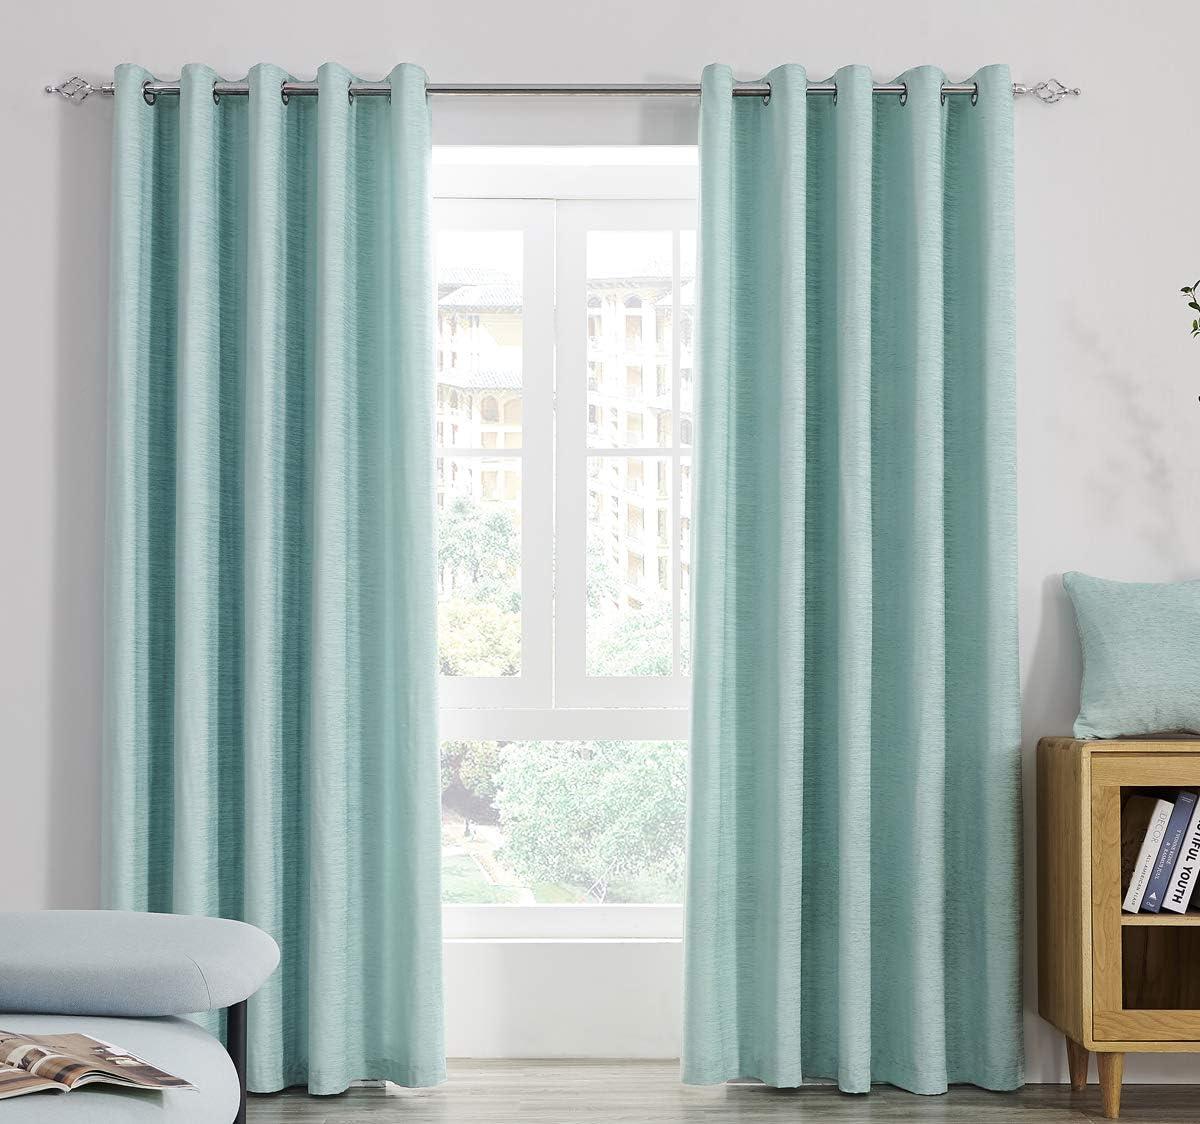 Super Soft Light Chenille Lined Eyelet Curtains Duckegg Blue, Window Treatment Blinds 2 Panels Floor Curtain for Bedroom, Livingroom, Kids Nursery Room 46x54 inch Duckegg 46x54